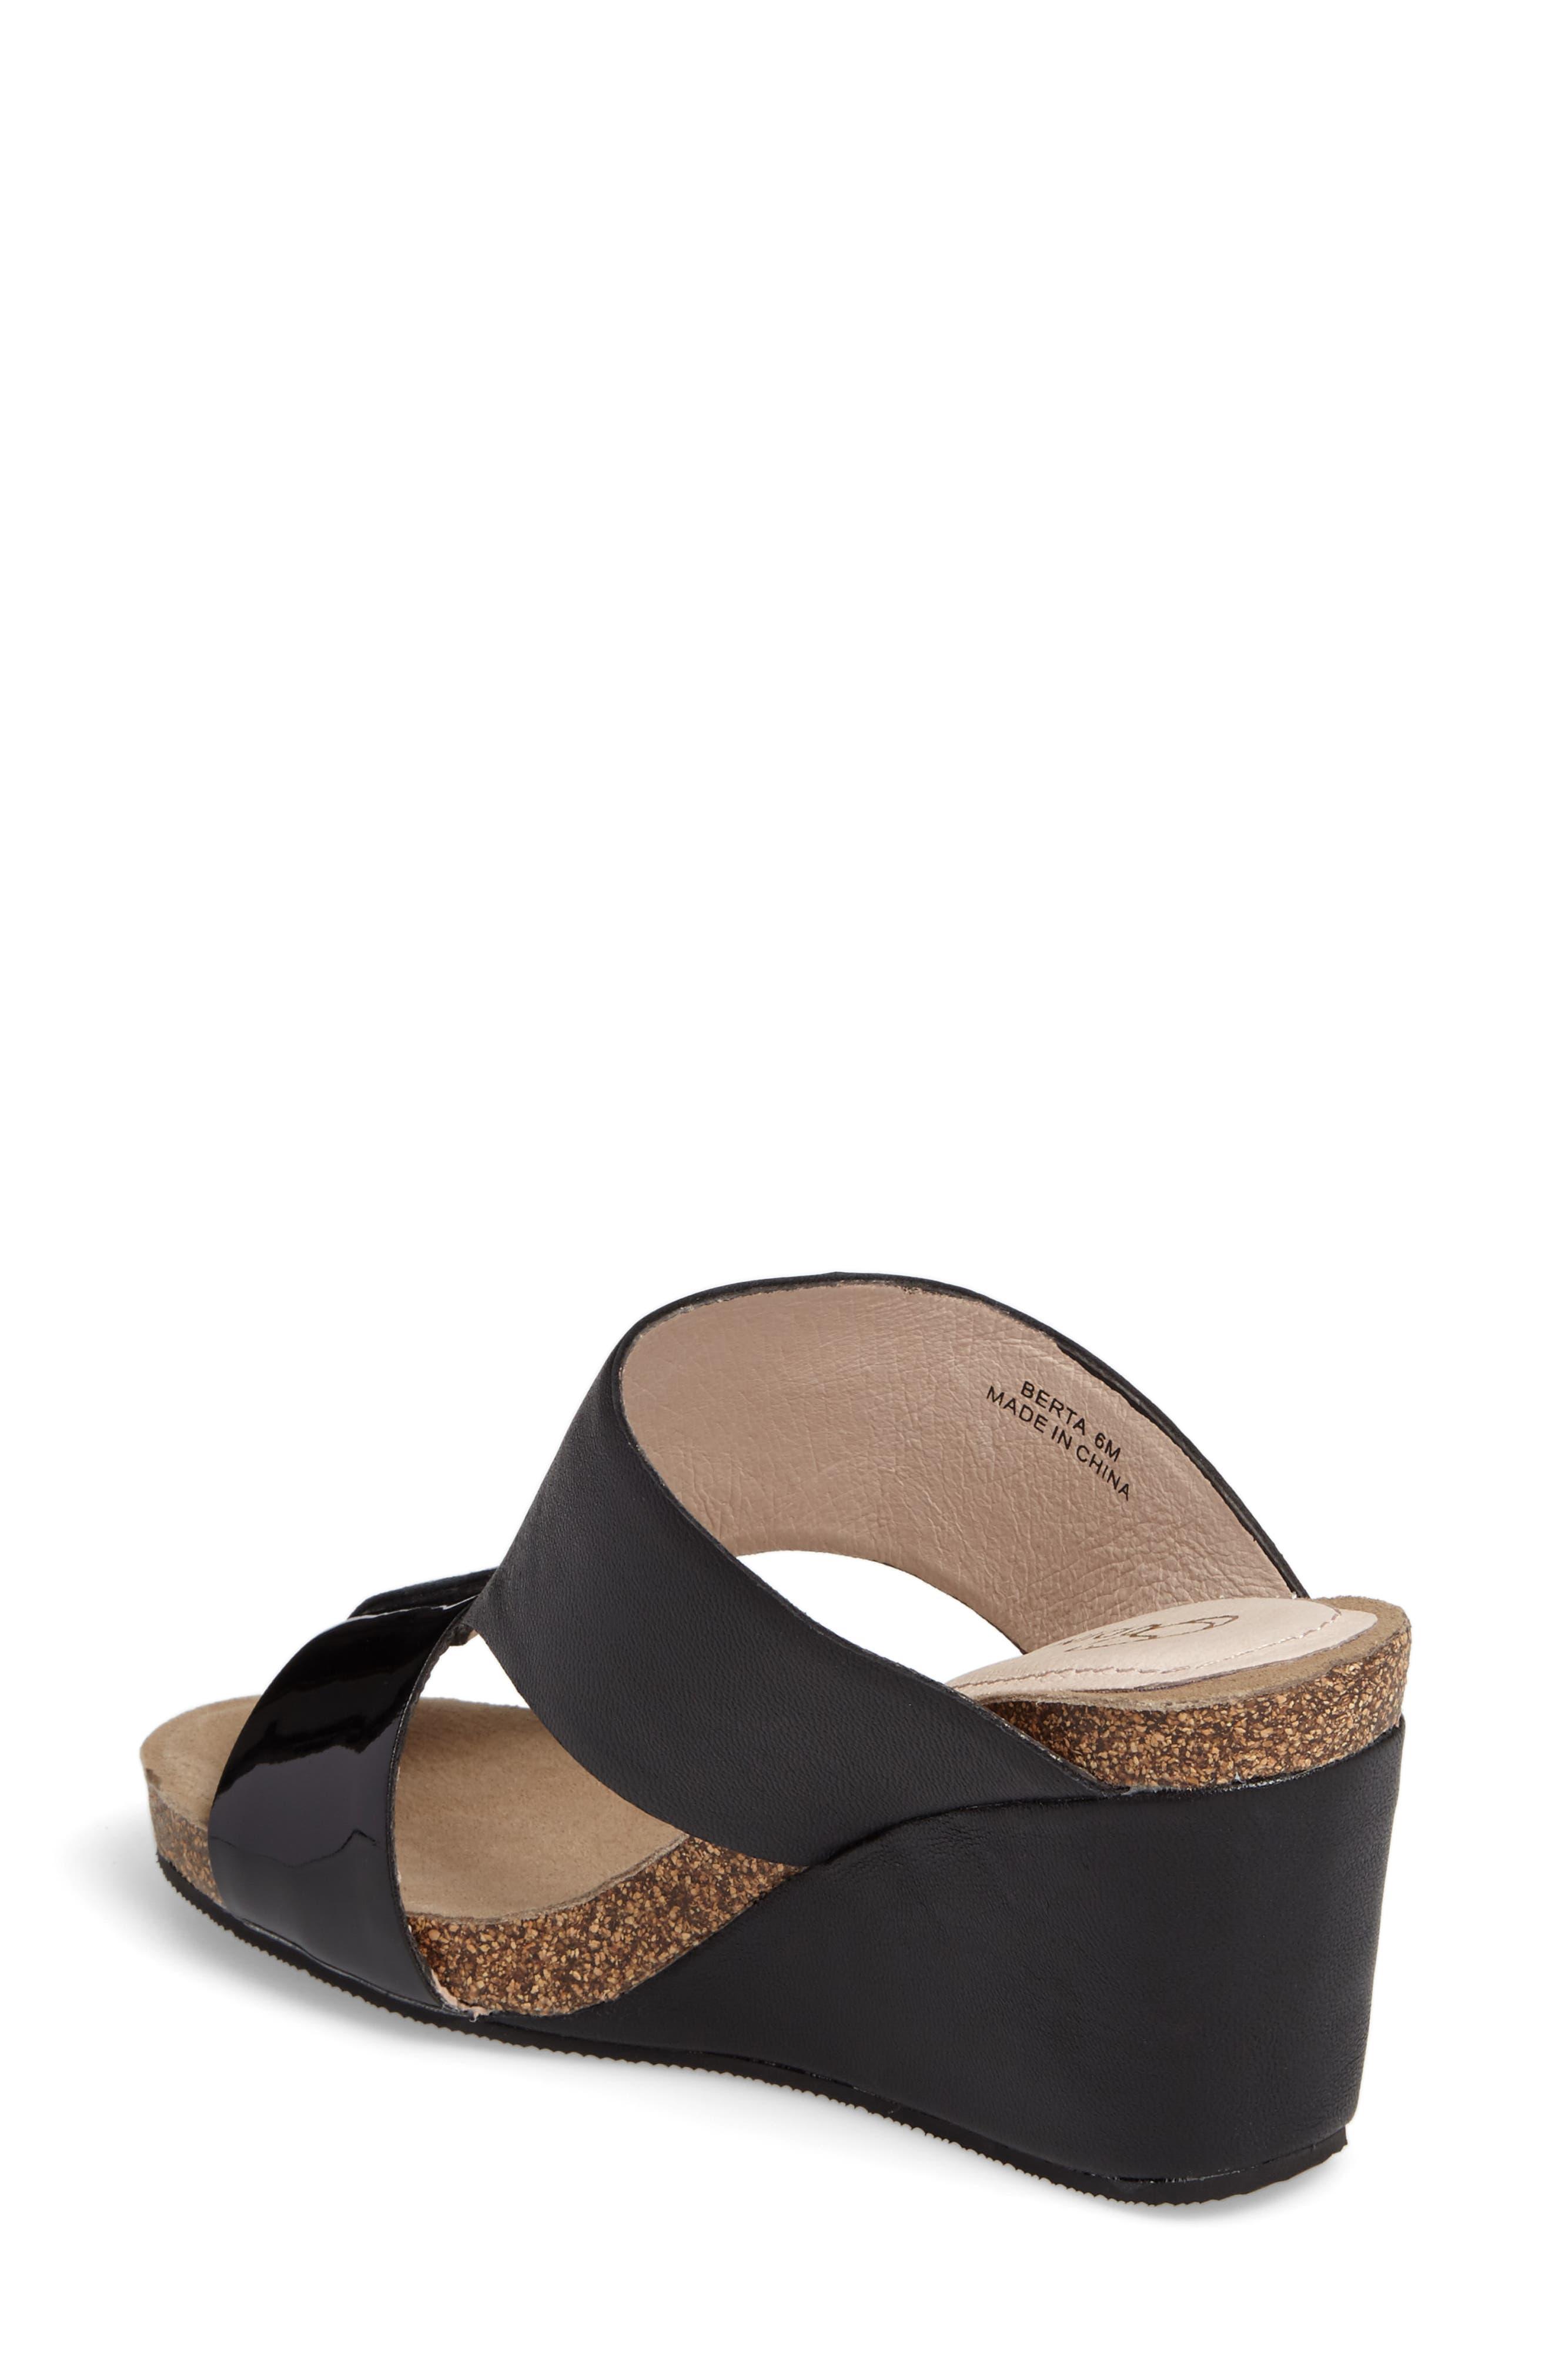 Berta Wedge Sandal,                             Alternate thumbnail 2, color,                             Black Leather